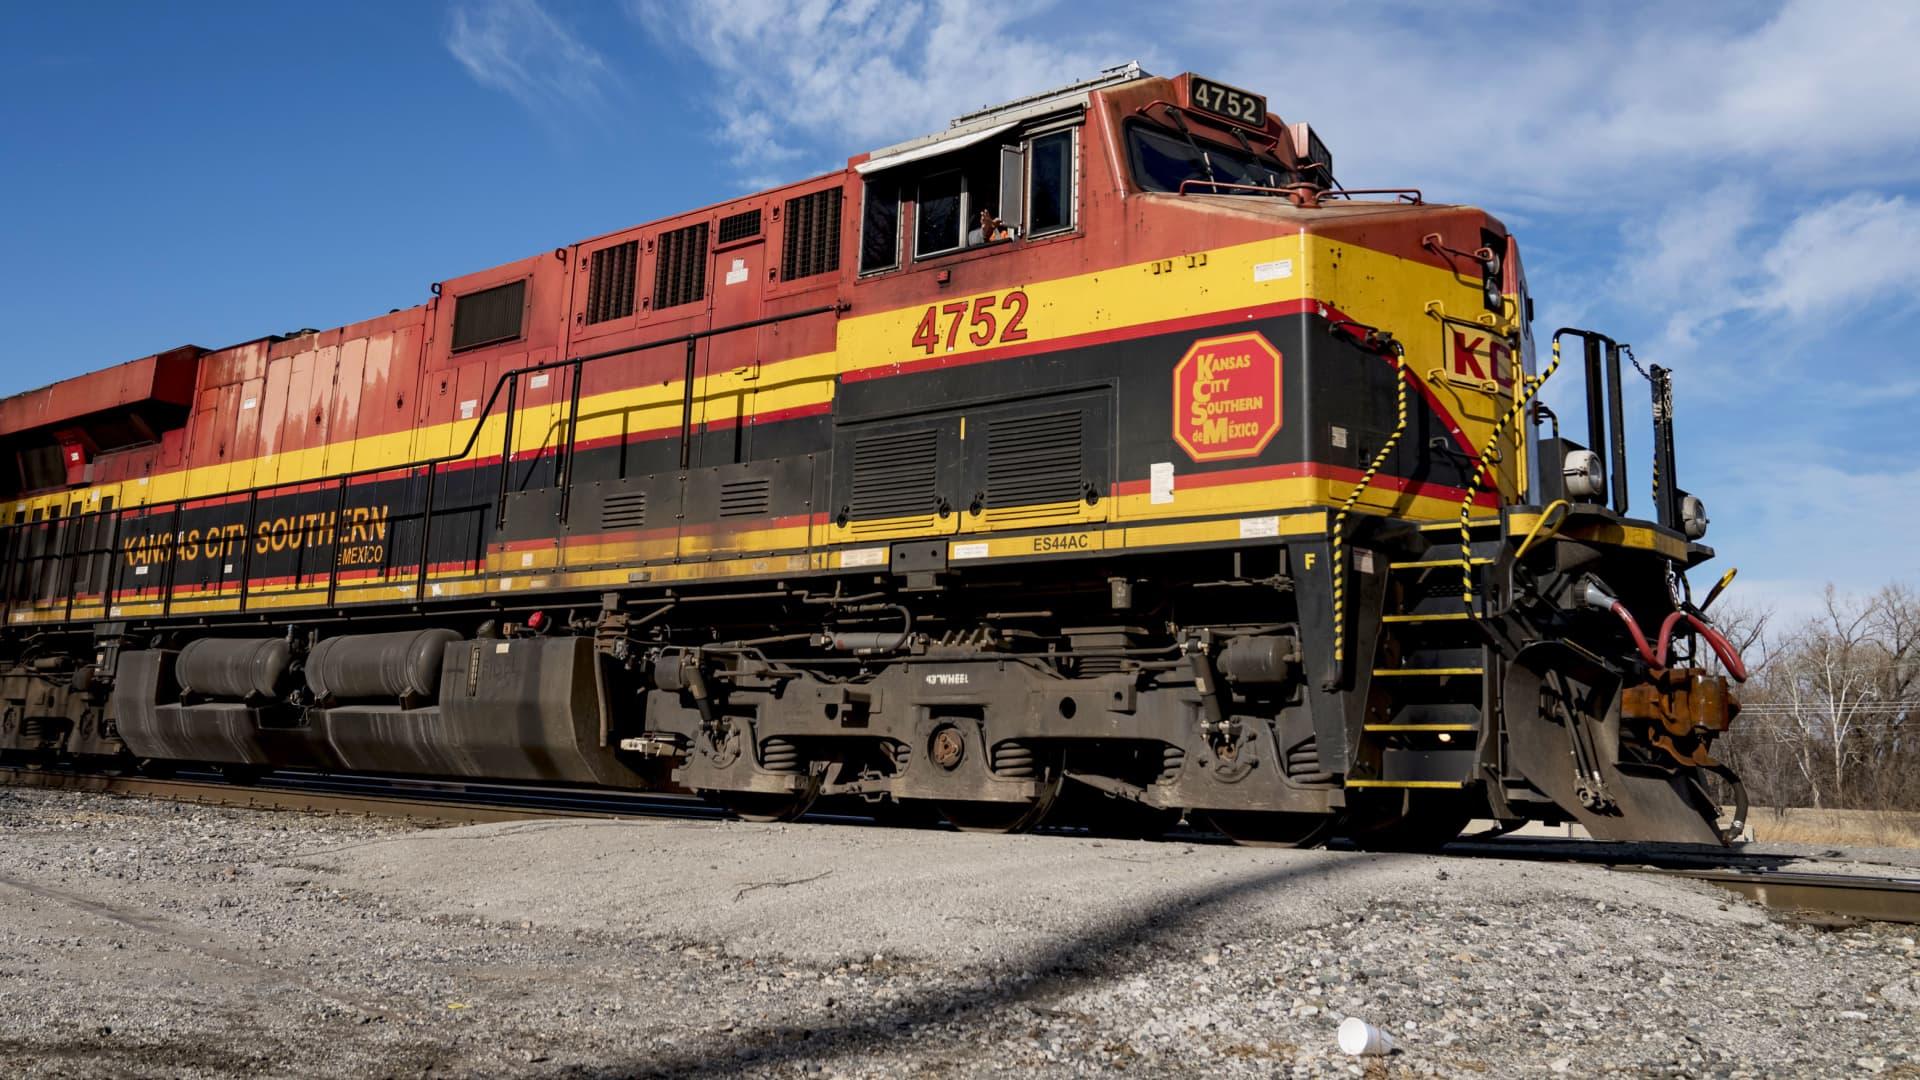 A Kansas City Southern (KSC) Railway locomotive passes through Knoche Yard in Kansas City, Missouri, on Tuesday, Jan. 7, 2020.